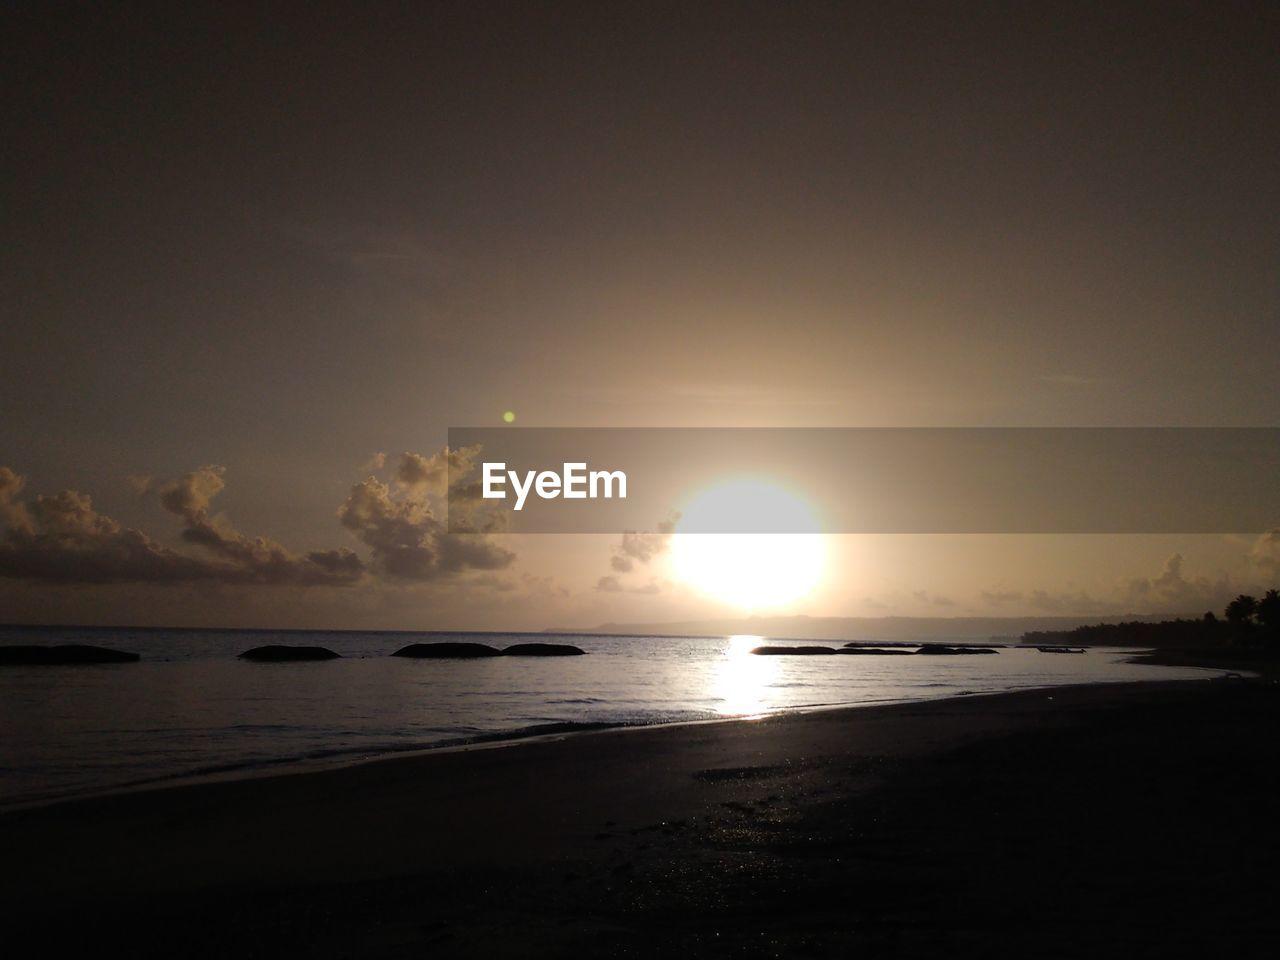 sky, water, sea, scenics - nature, sun, beauty in nature, sunset, tranquility, tranquil scene, beach, horizon over water, horizon, sunlight, nature, land, idyllic, silhouette, no people, outdoors